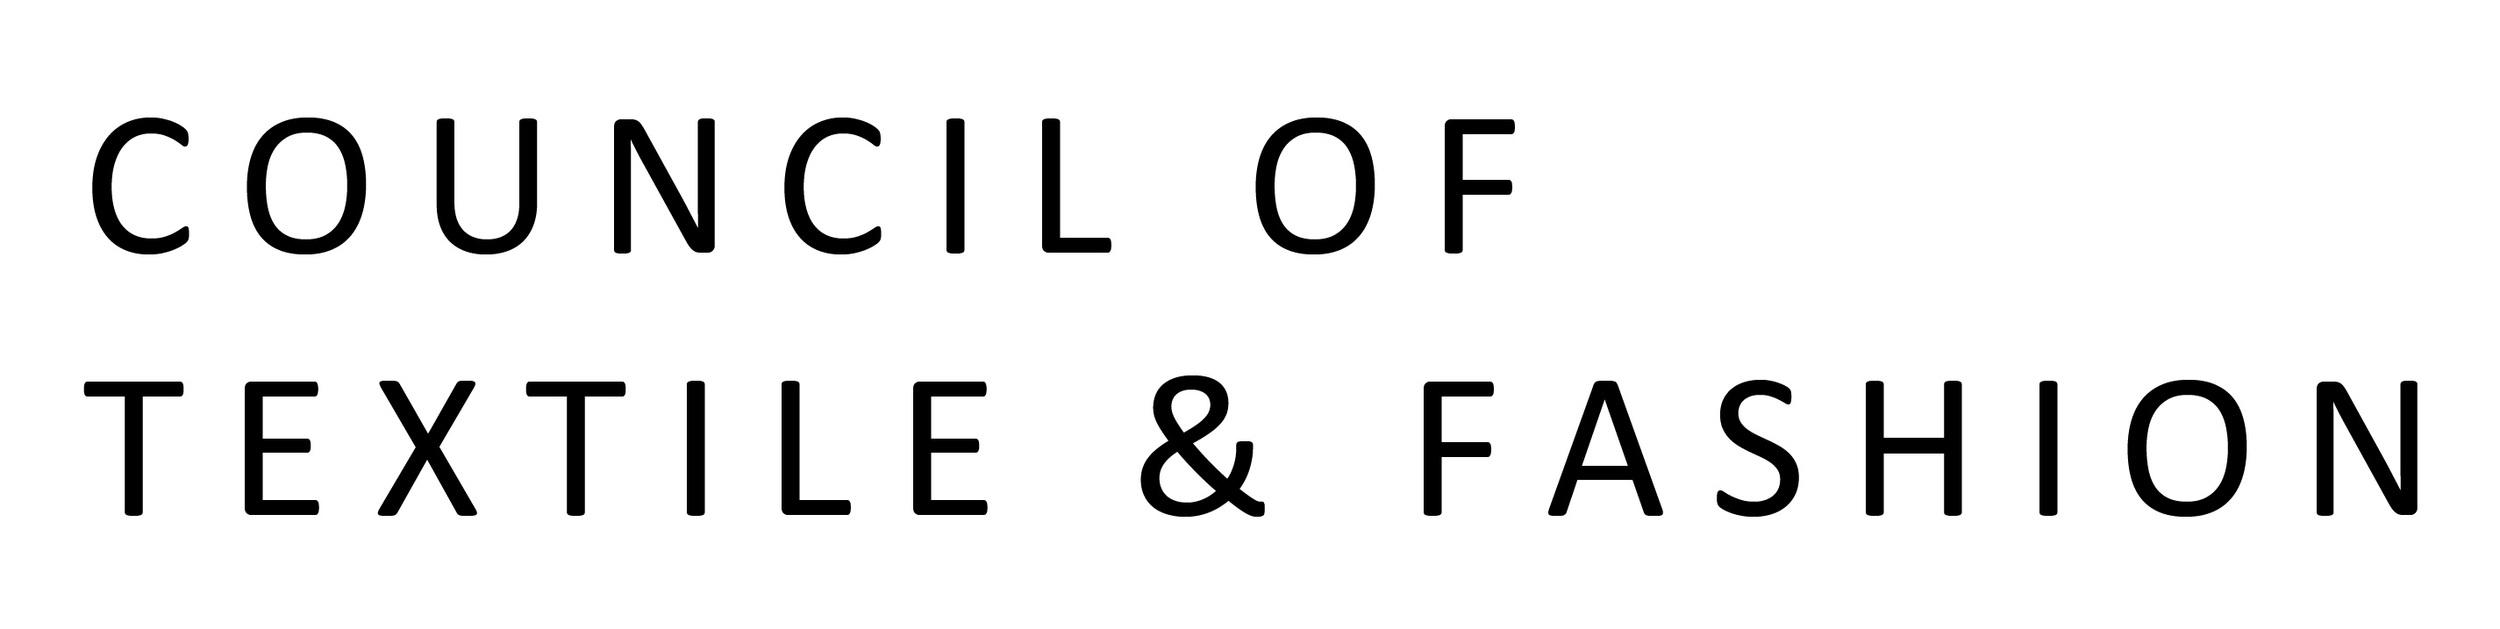 council-of-textile-fashion-logo-01.jpg